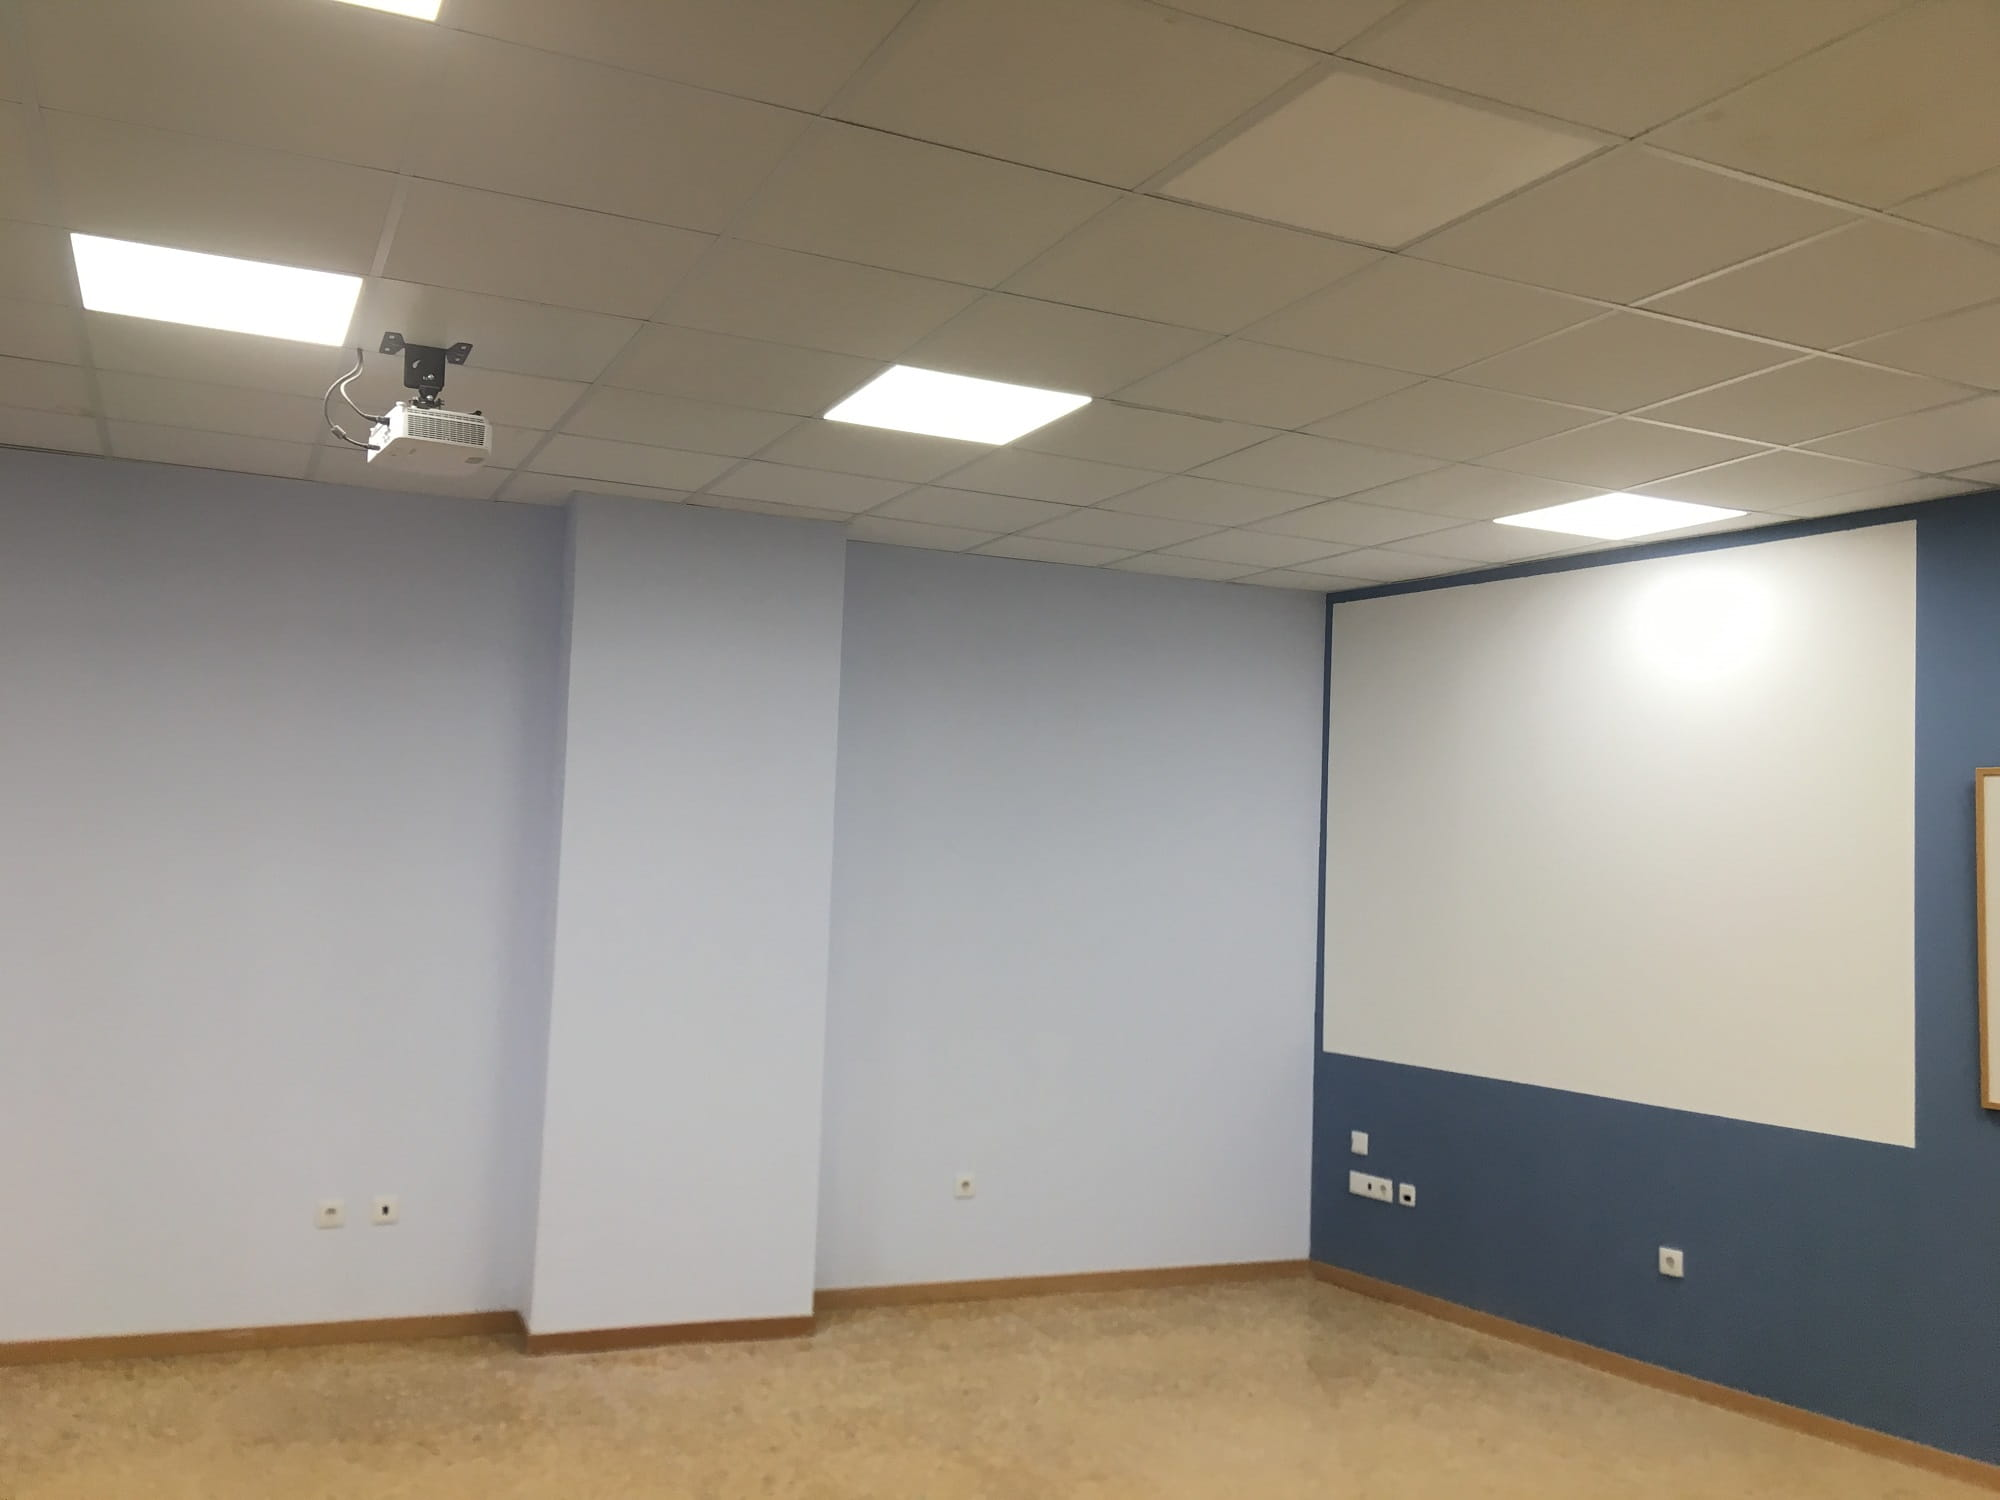 AREA FORMACION VALENCIA - CENTRO POETA ALBEROLA - AULAS_AUDIOVISUAL 2000X1500-min